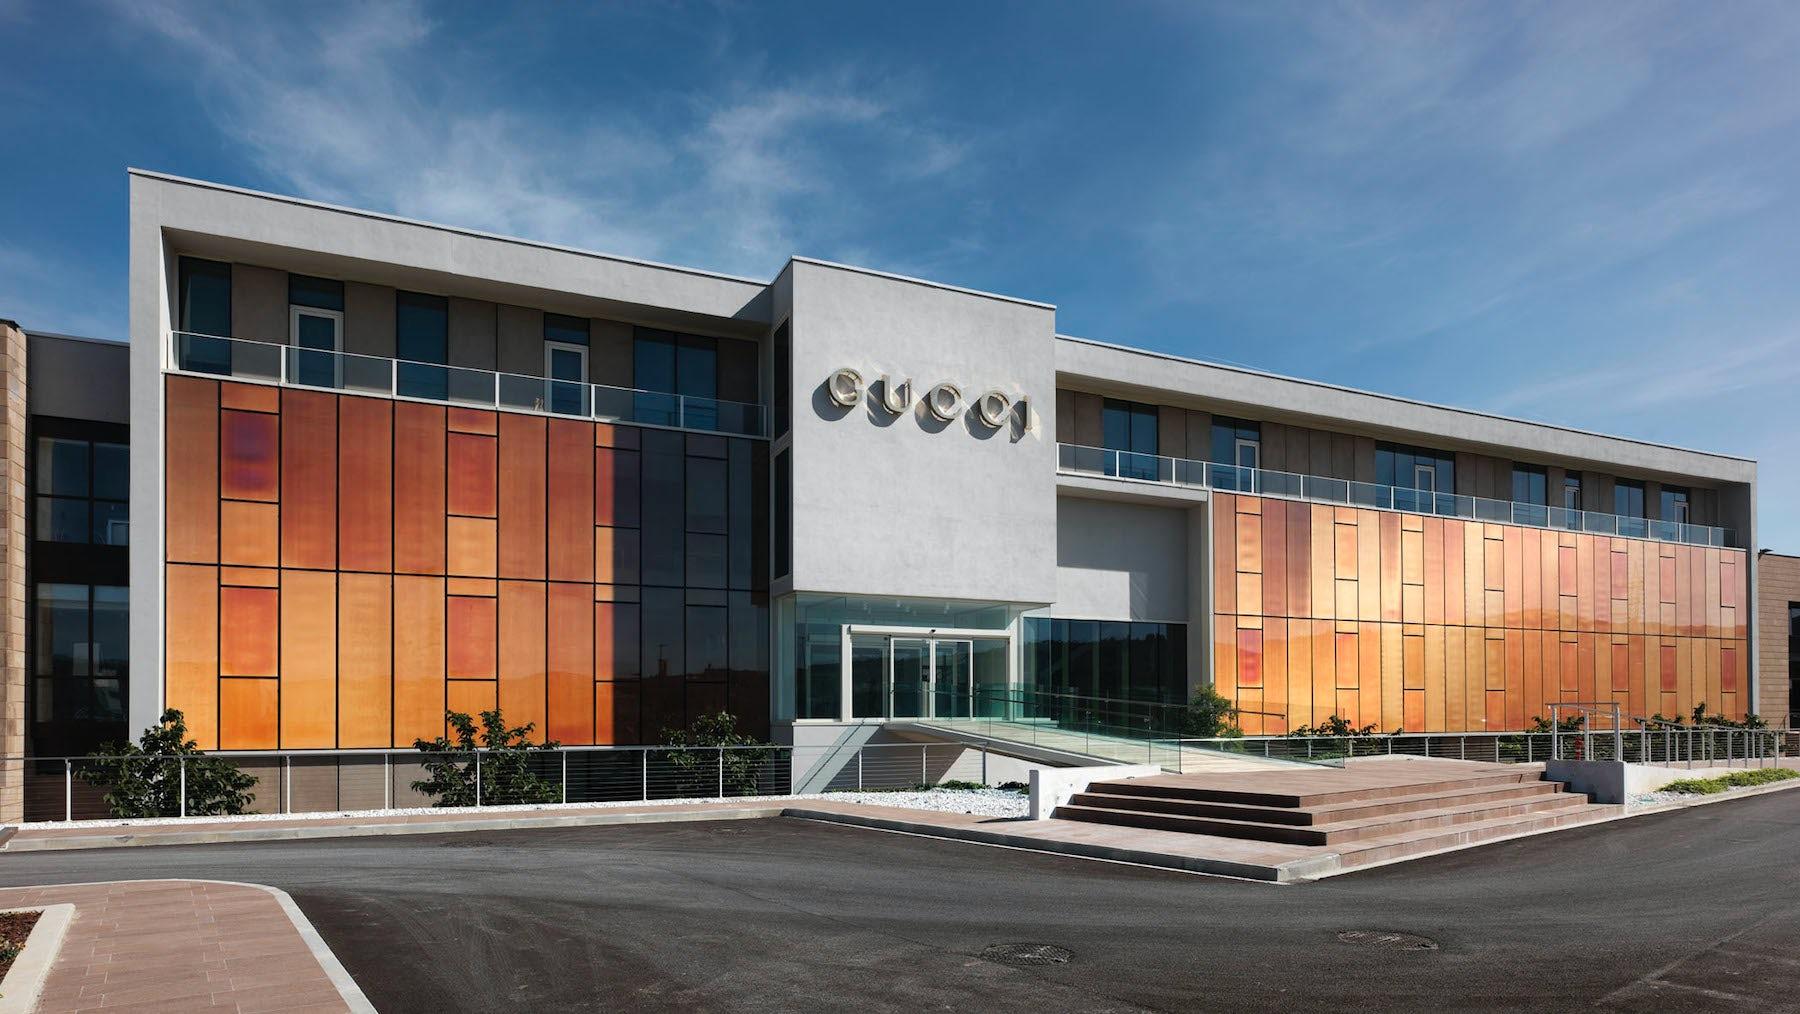 Gucci headquarters | Source: Gucci